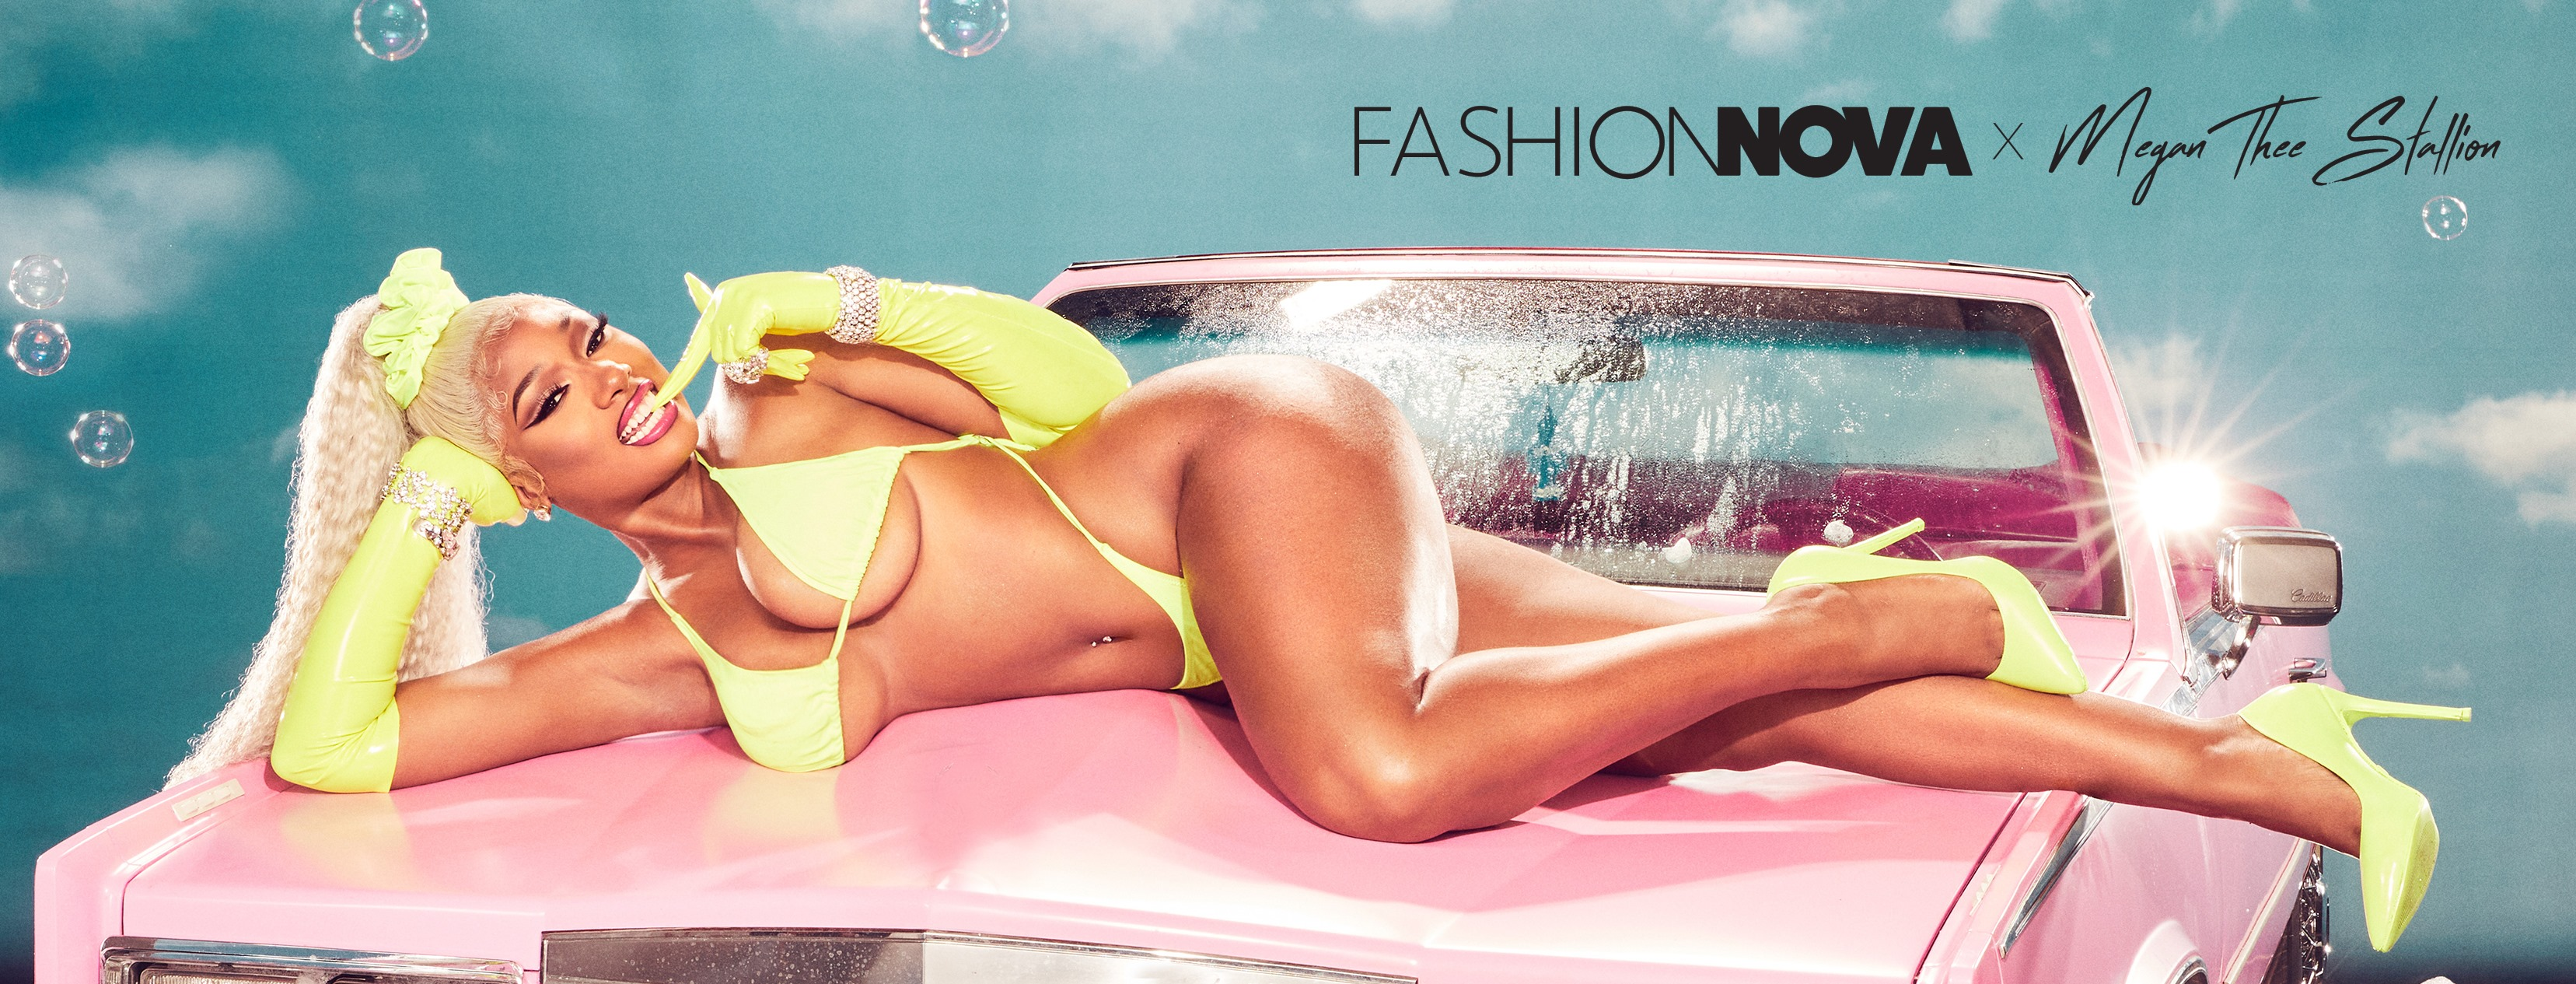 About Fashion Nova Homepage